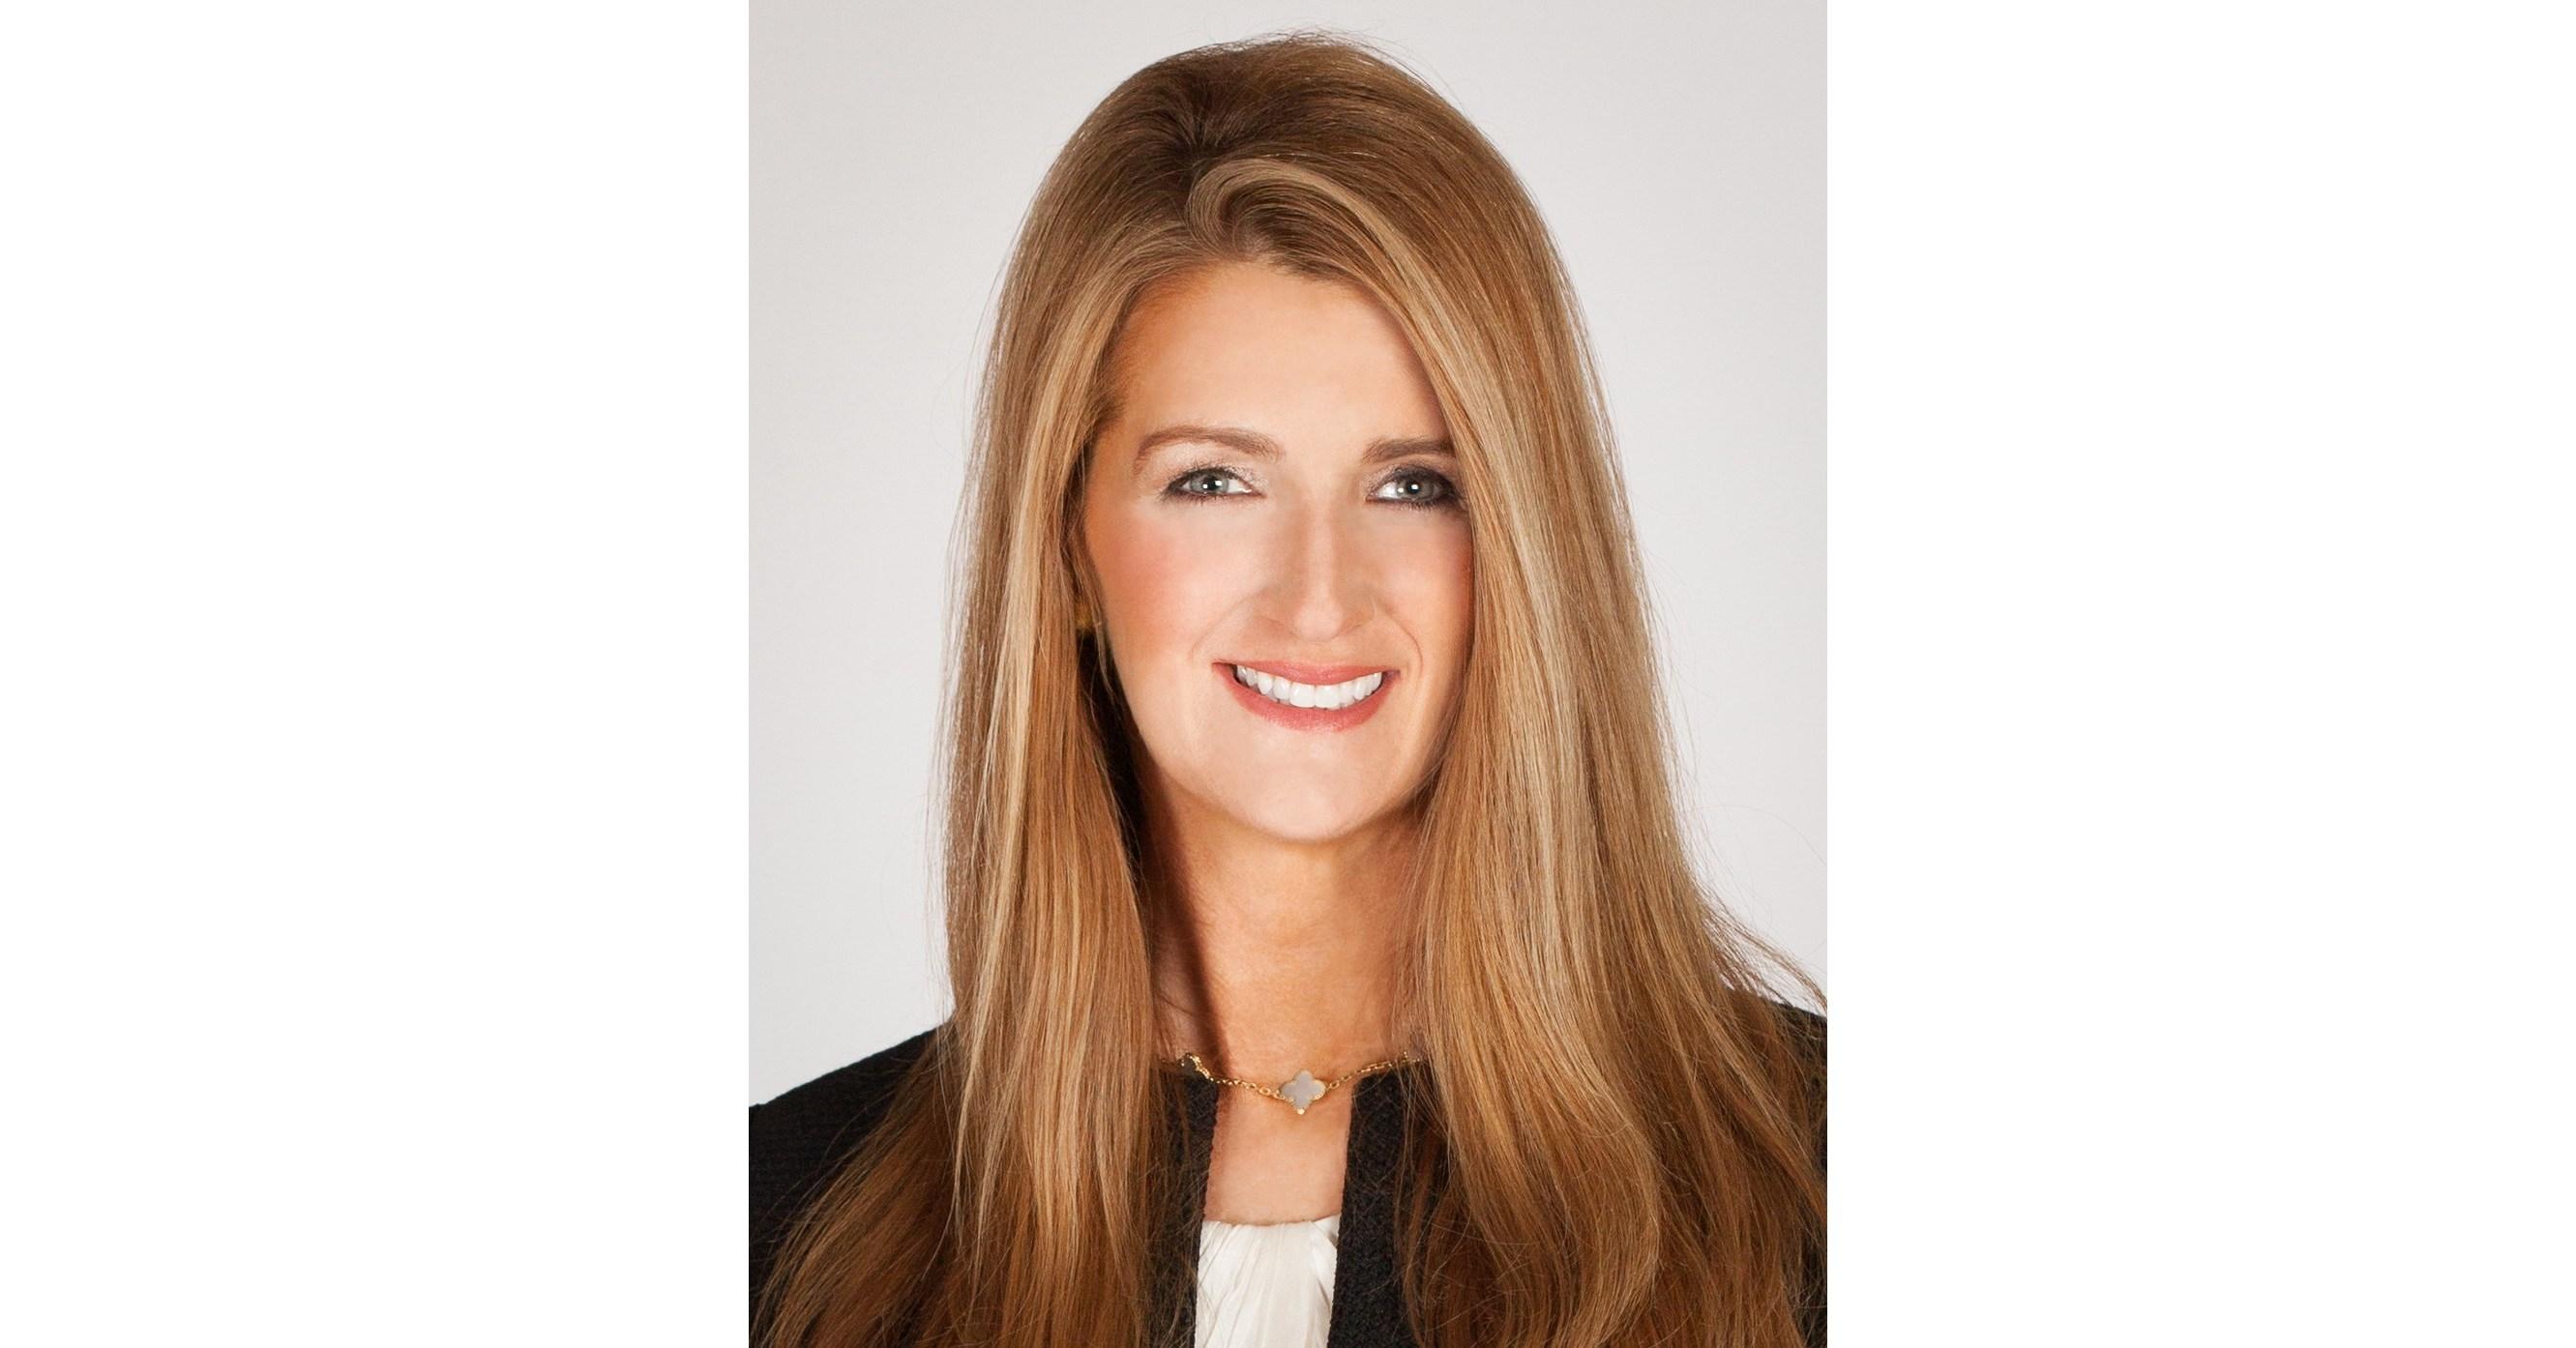 Kelly L. Loeffler named to Georgia Power Board of Directors